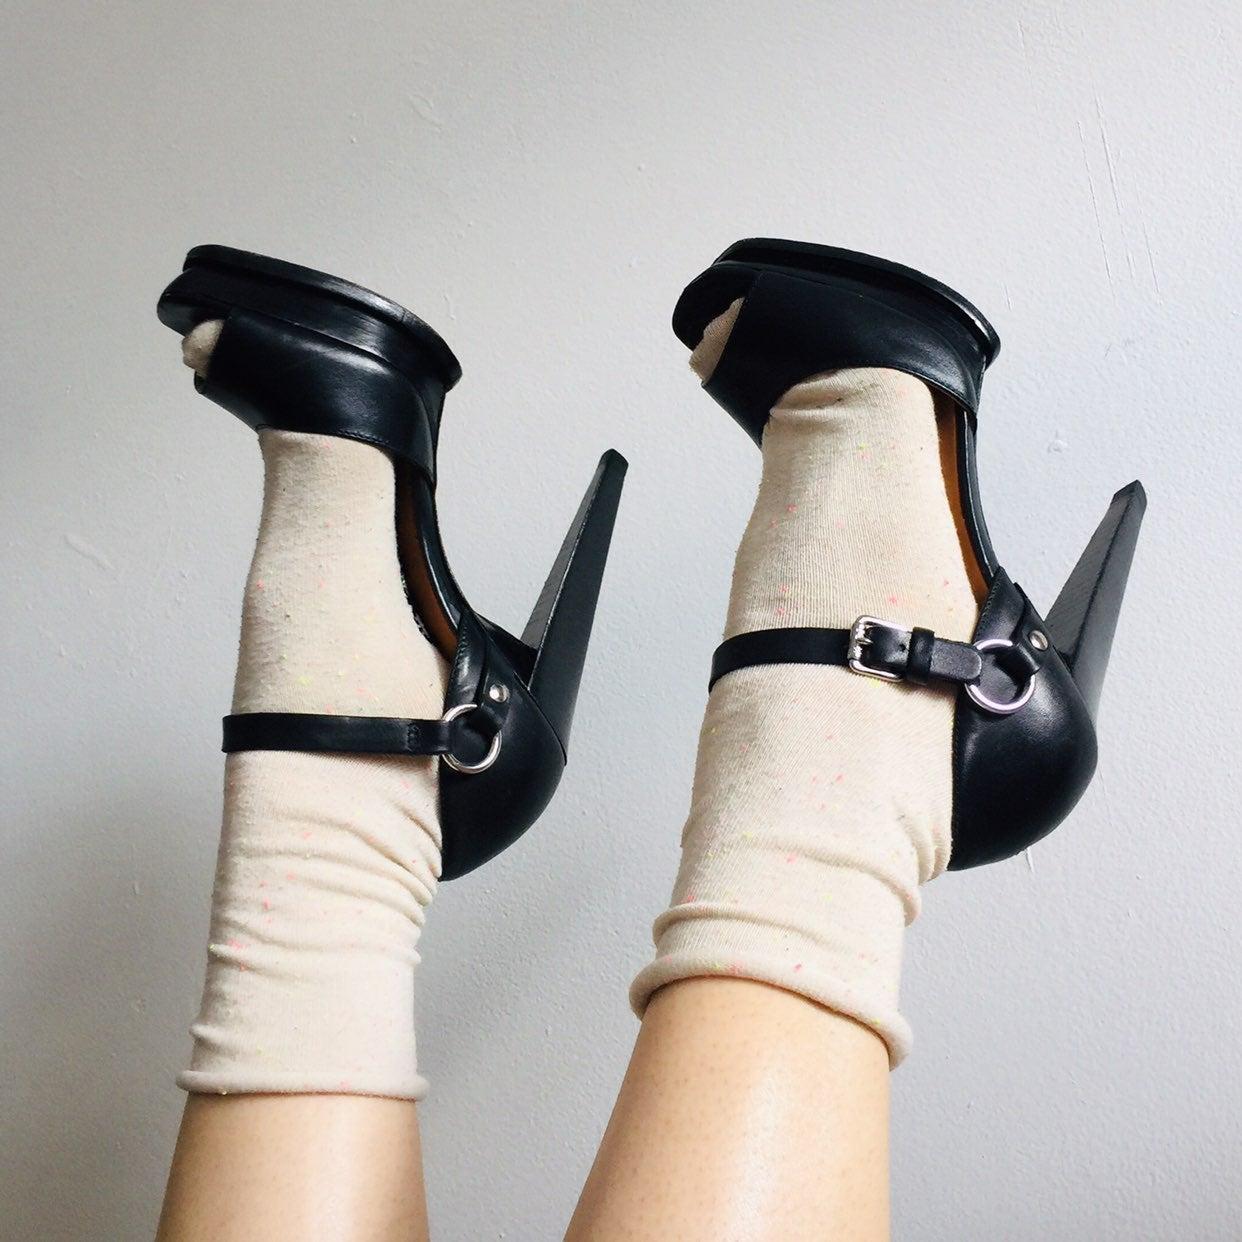 Kors platform sandal heels sz 7